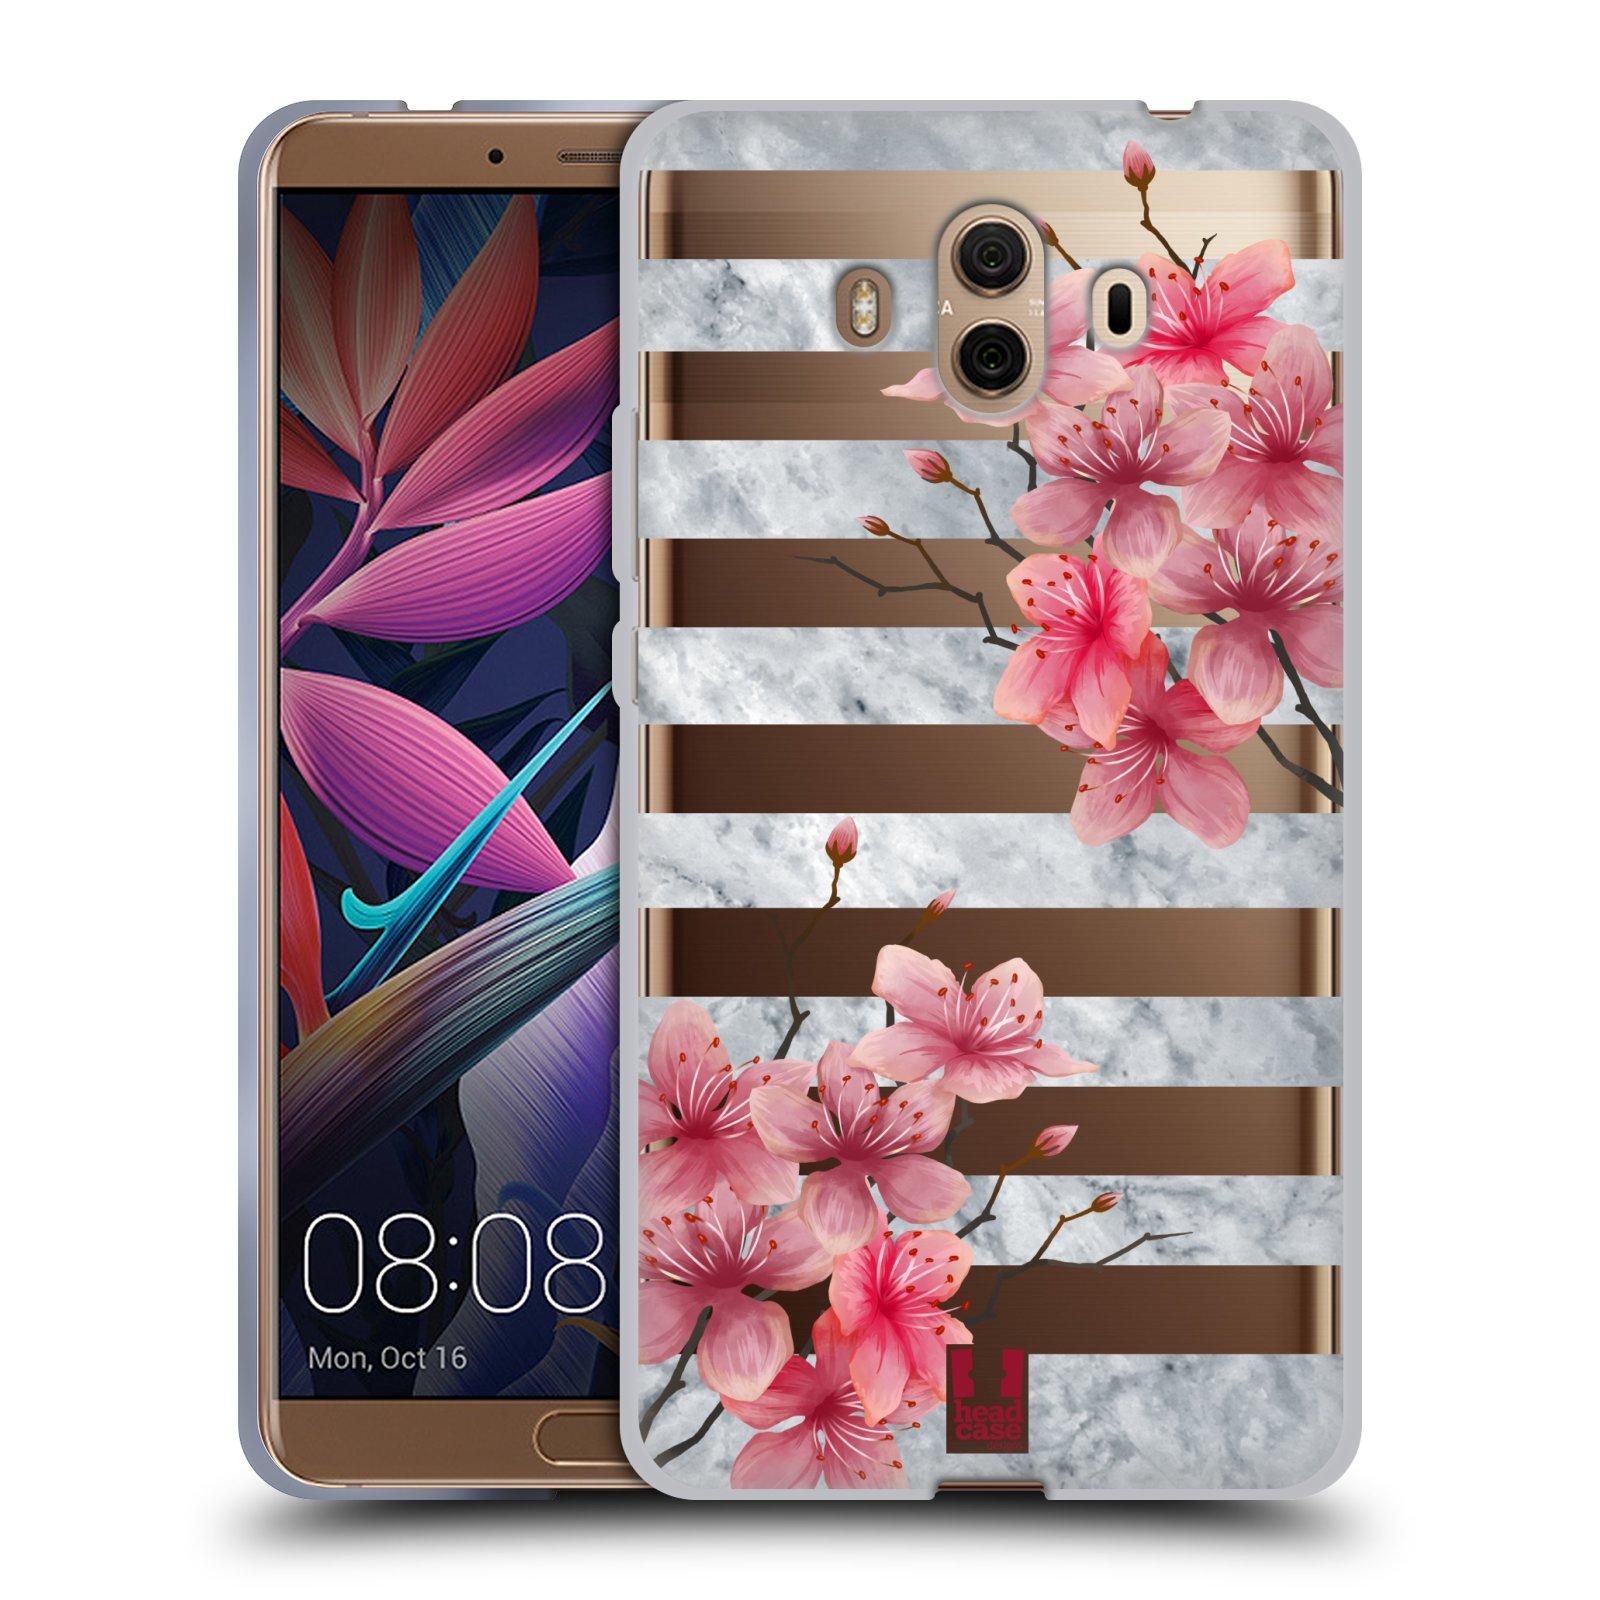 Silikonové pouzdro na mobil Huawei Mate 10 - Head Case - Kvítka a mramor